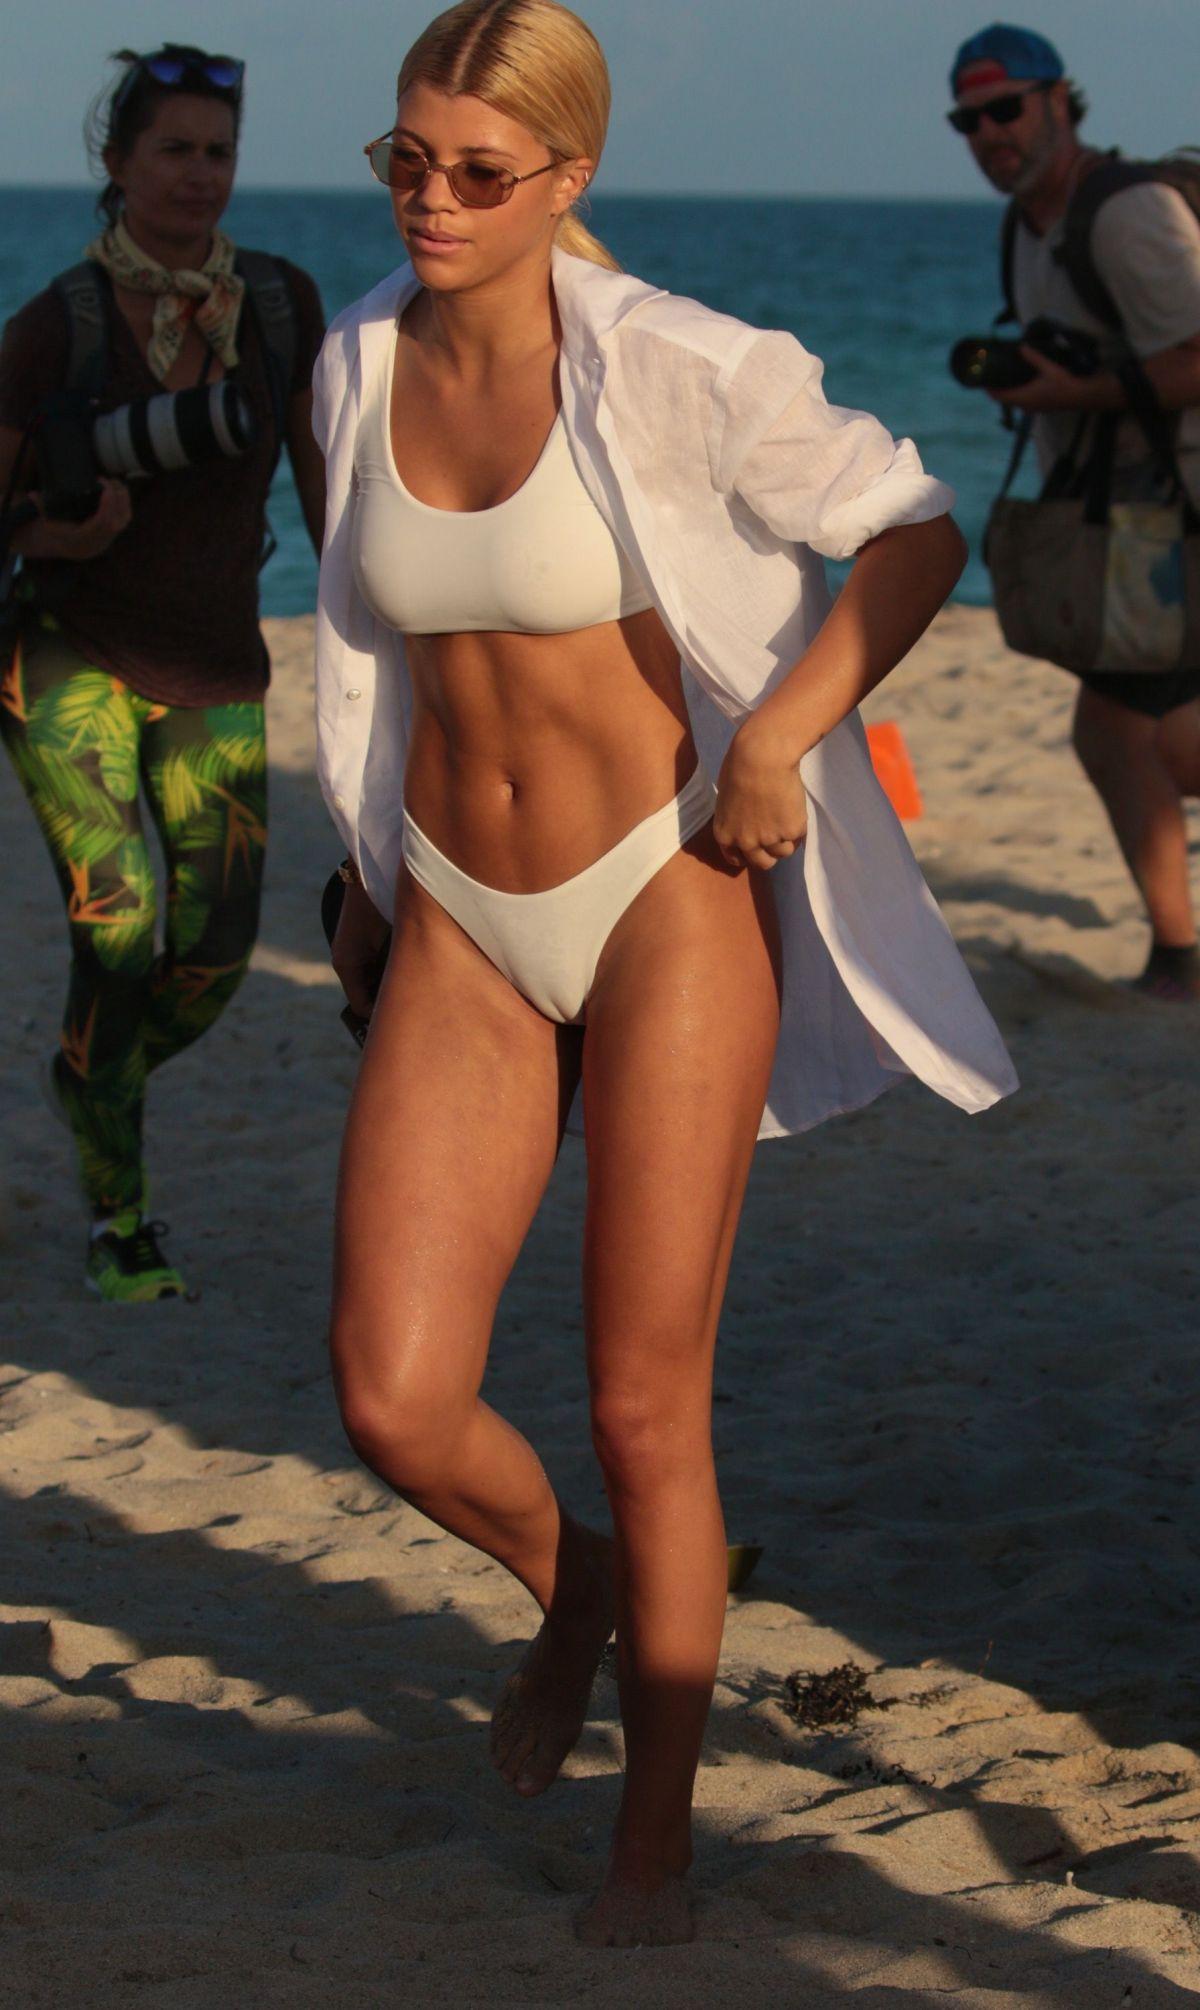 Danielle Herrington and Raven Lyn in Bikini at a Miami Beach Pic 6 of 35